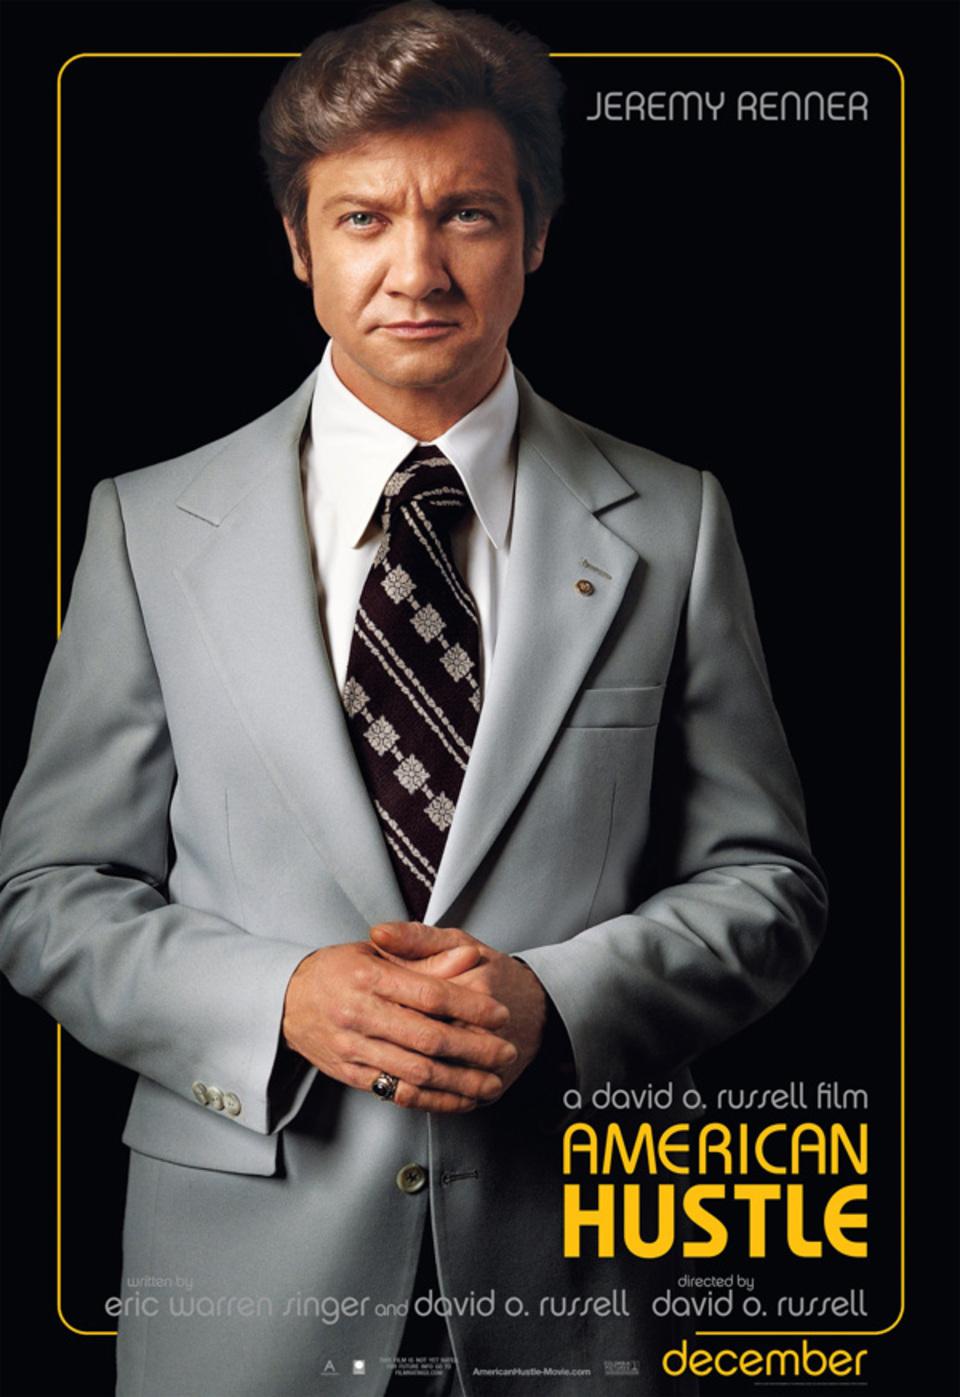 Jeremy Renner American Hustle movie poster